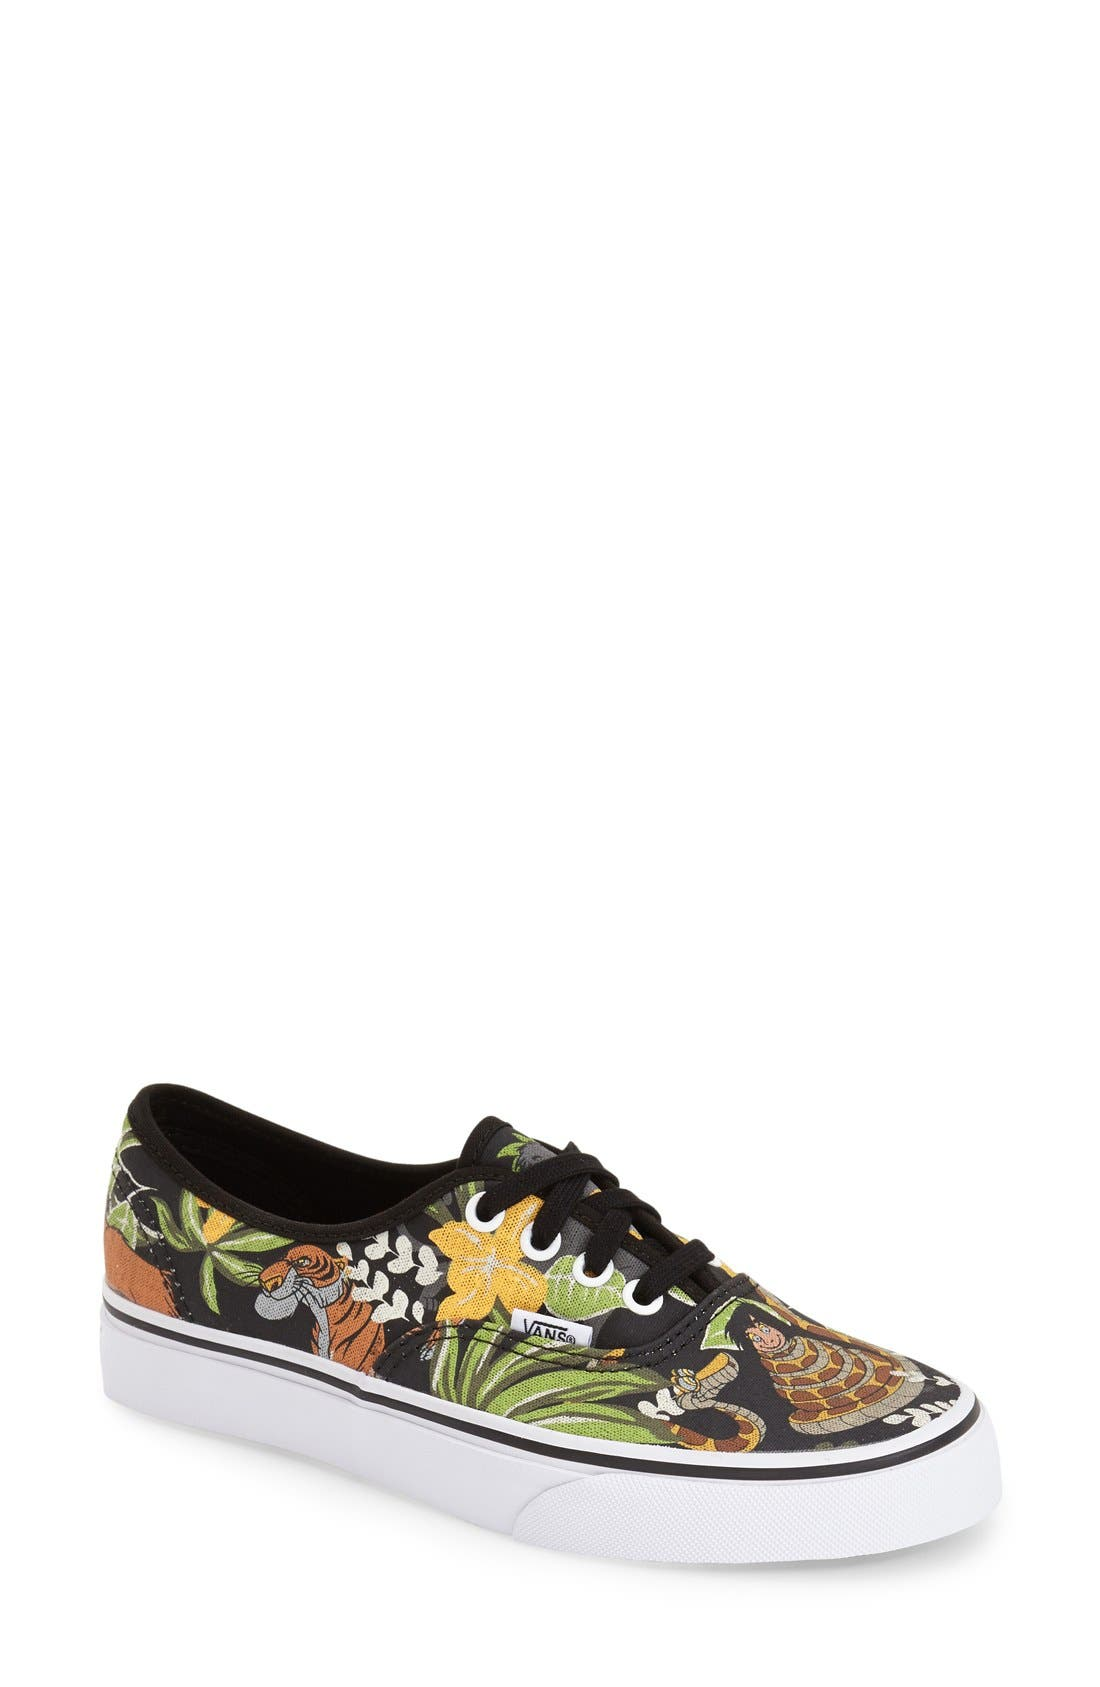 Alternate Image 1 Selected - Vans 'Authentic - Disney® The Jungle Book' Sneaker (Women)